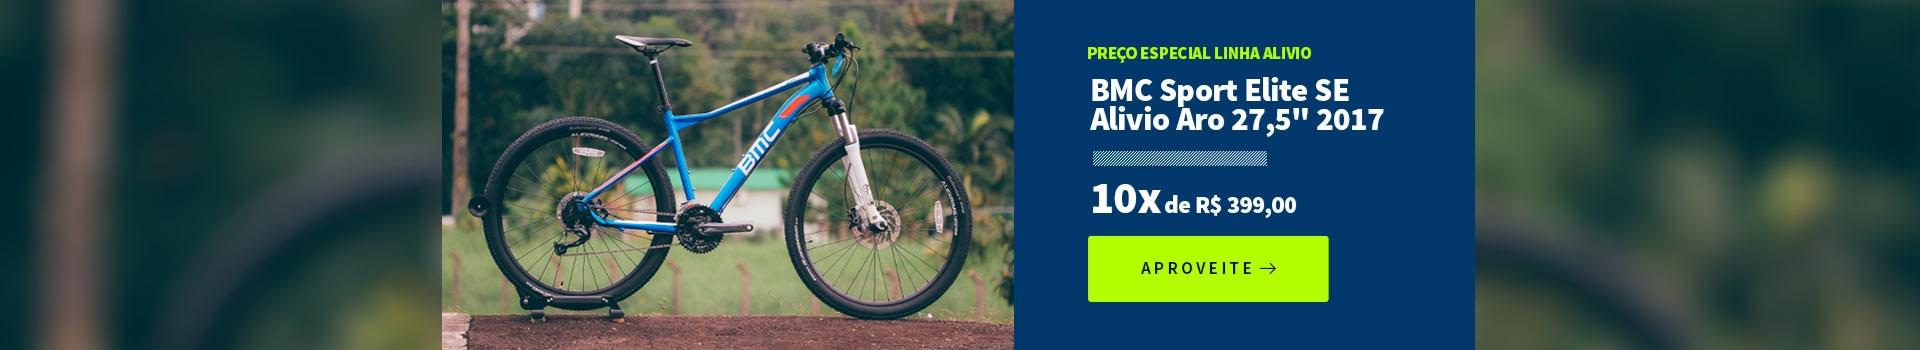 BMC Sport Elite SE Alivio